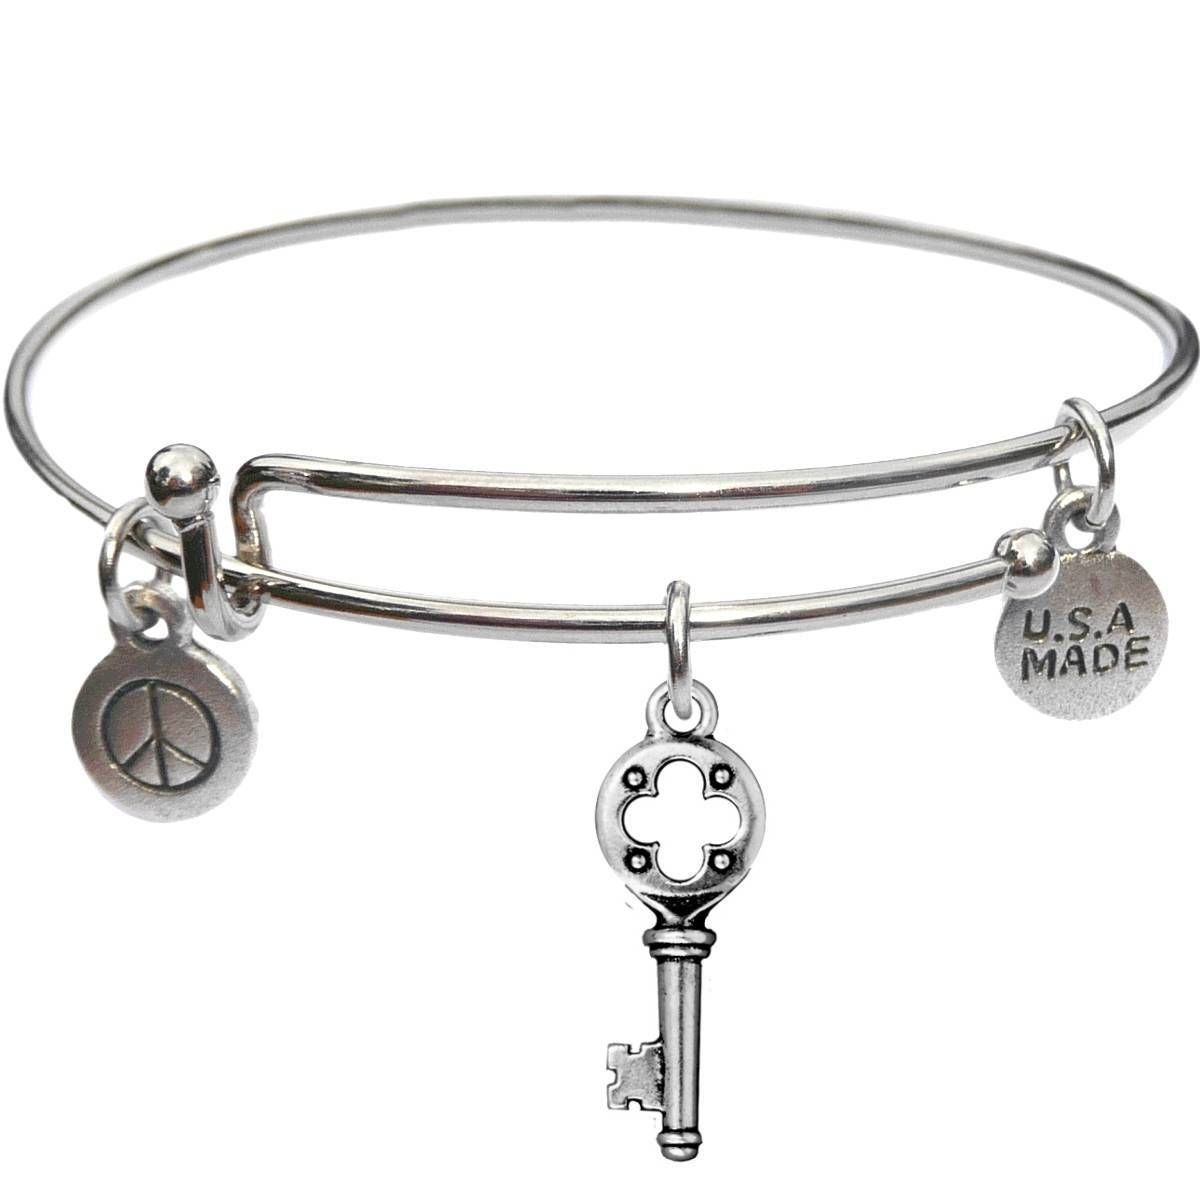 Bangle Bracelet and Quaterfoil Key - USA Made - BBandJT182